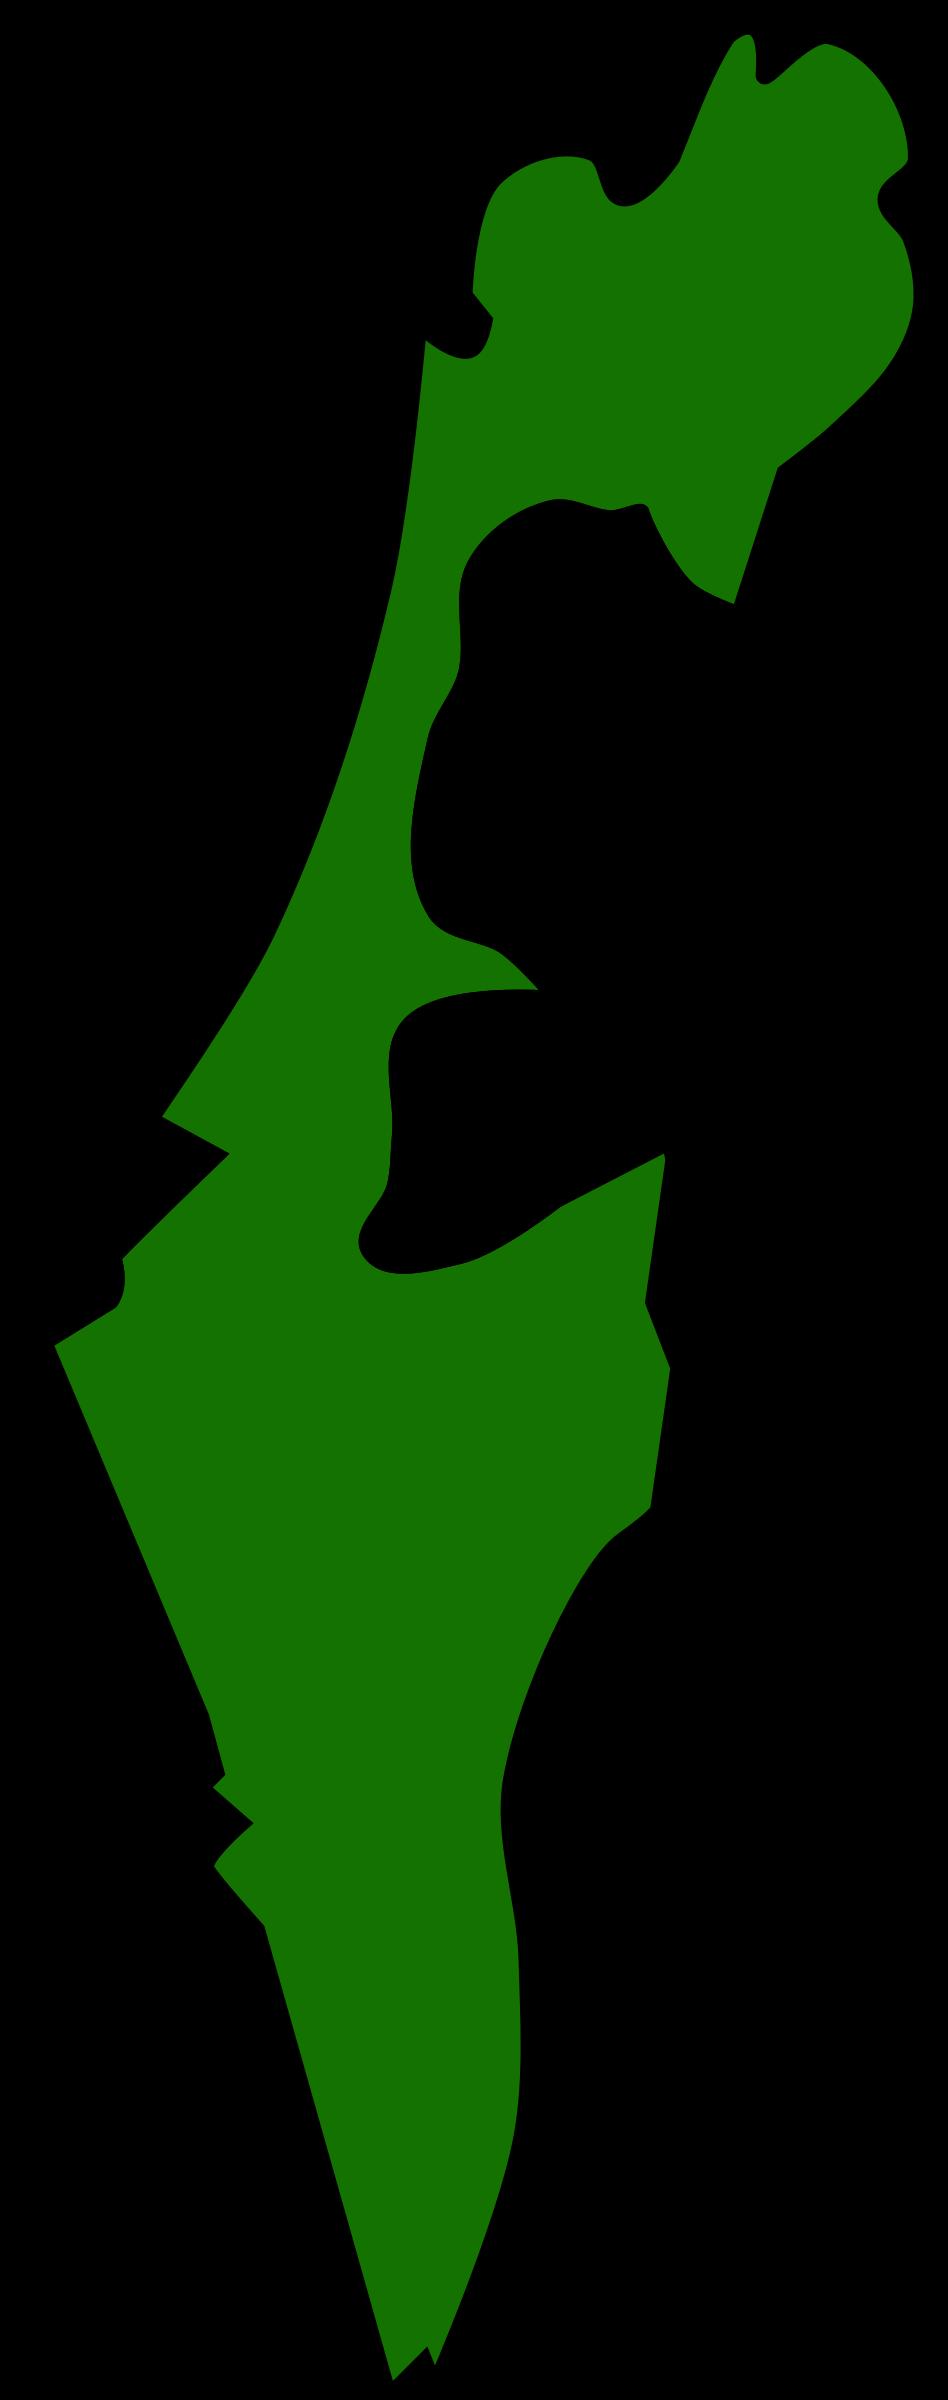 BIG IMAGE (PNG) - Israel Map PNG